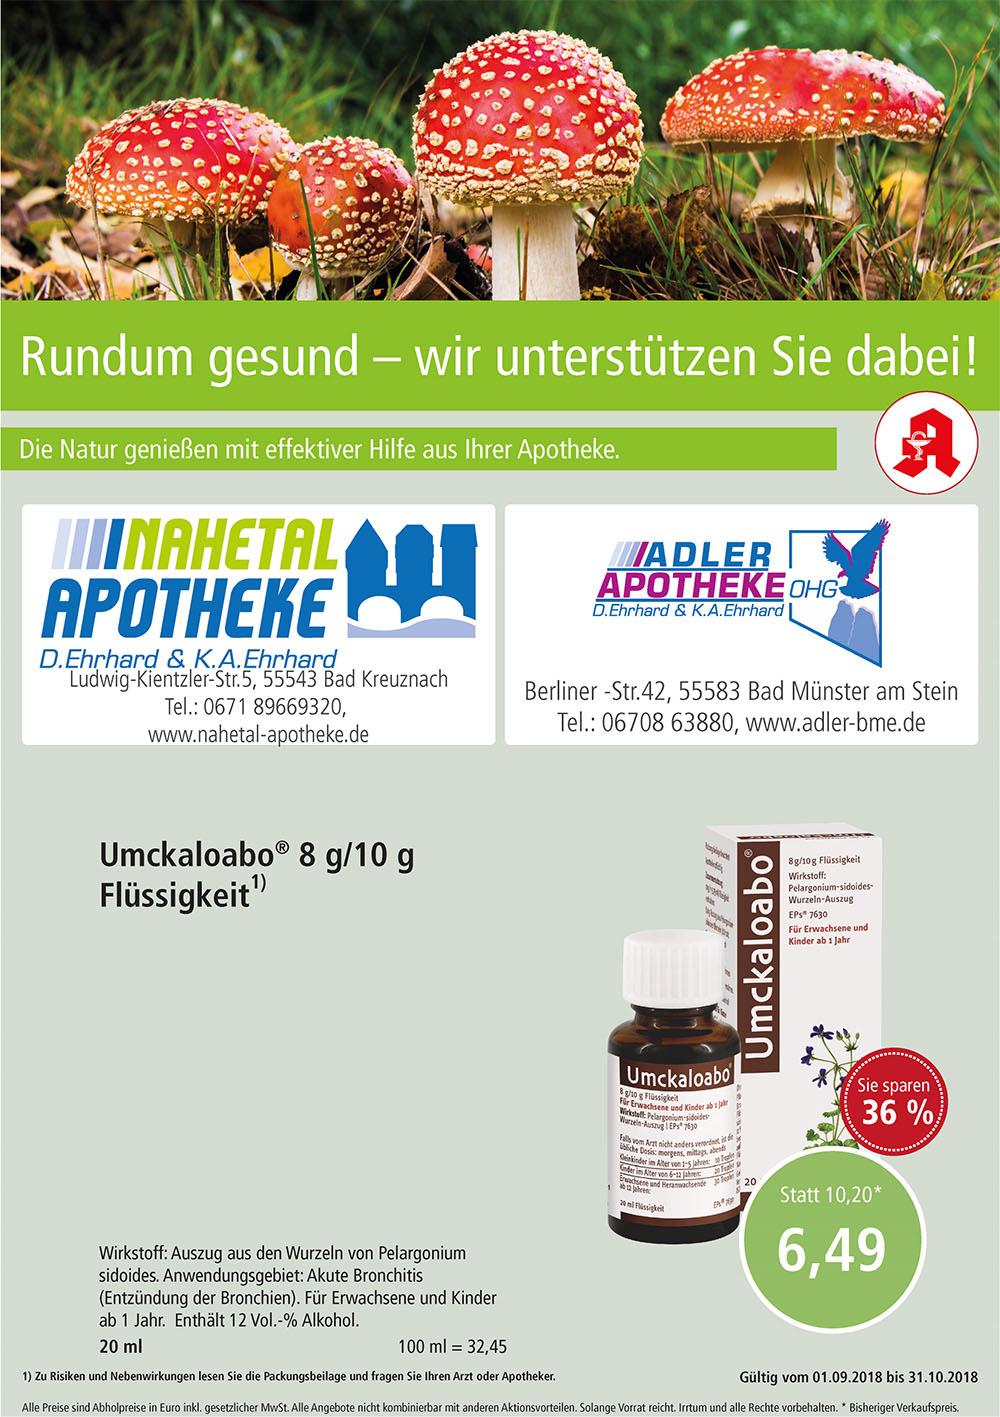 http://www.apotheken.de/fileadmin/clubarea/00000-Angebote/55543_nahetal_angebot_1.jpg